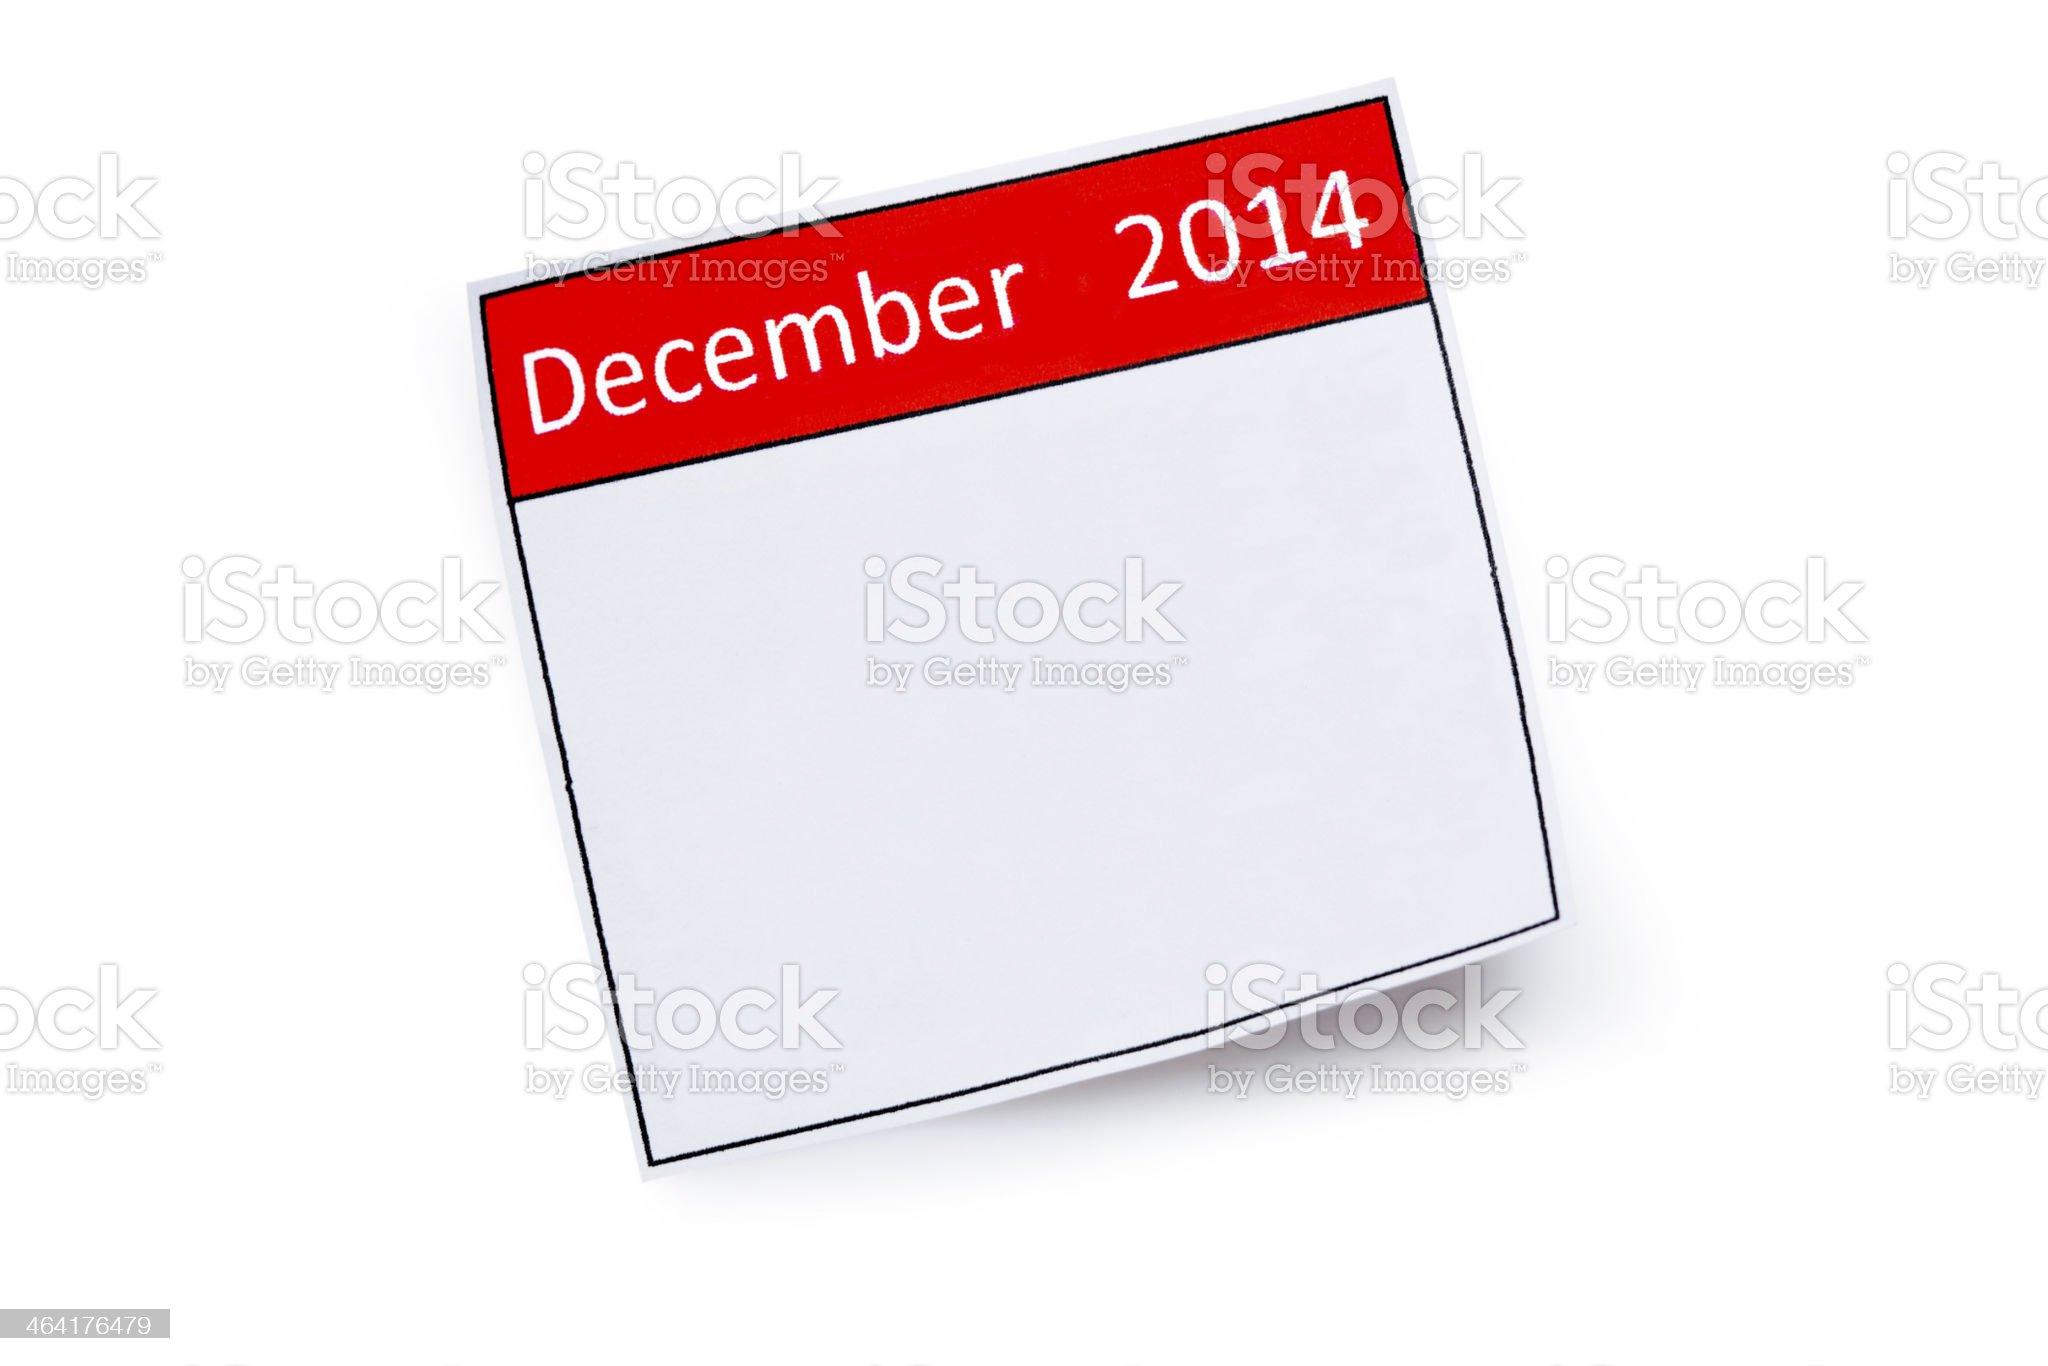 December 2014 Calendar royalty-free stock photo